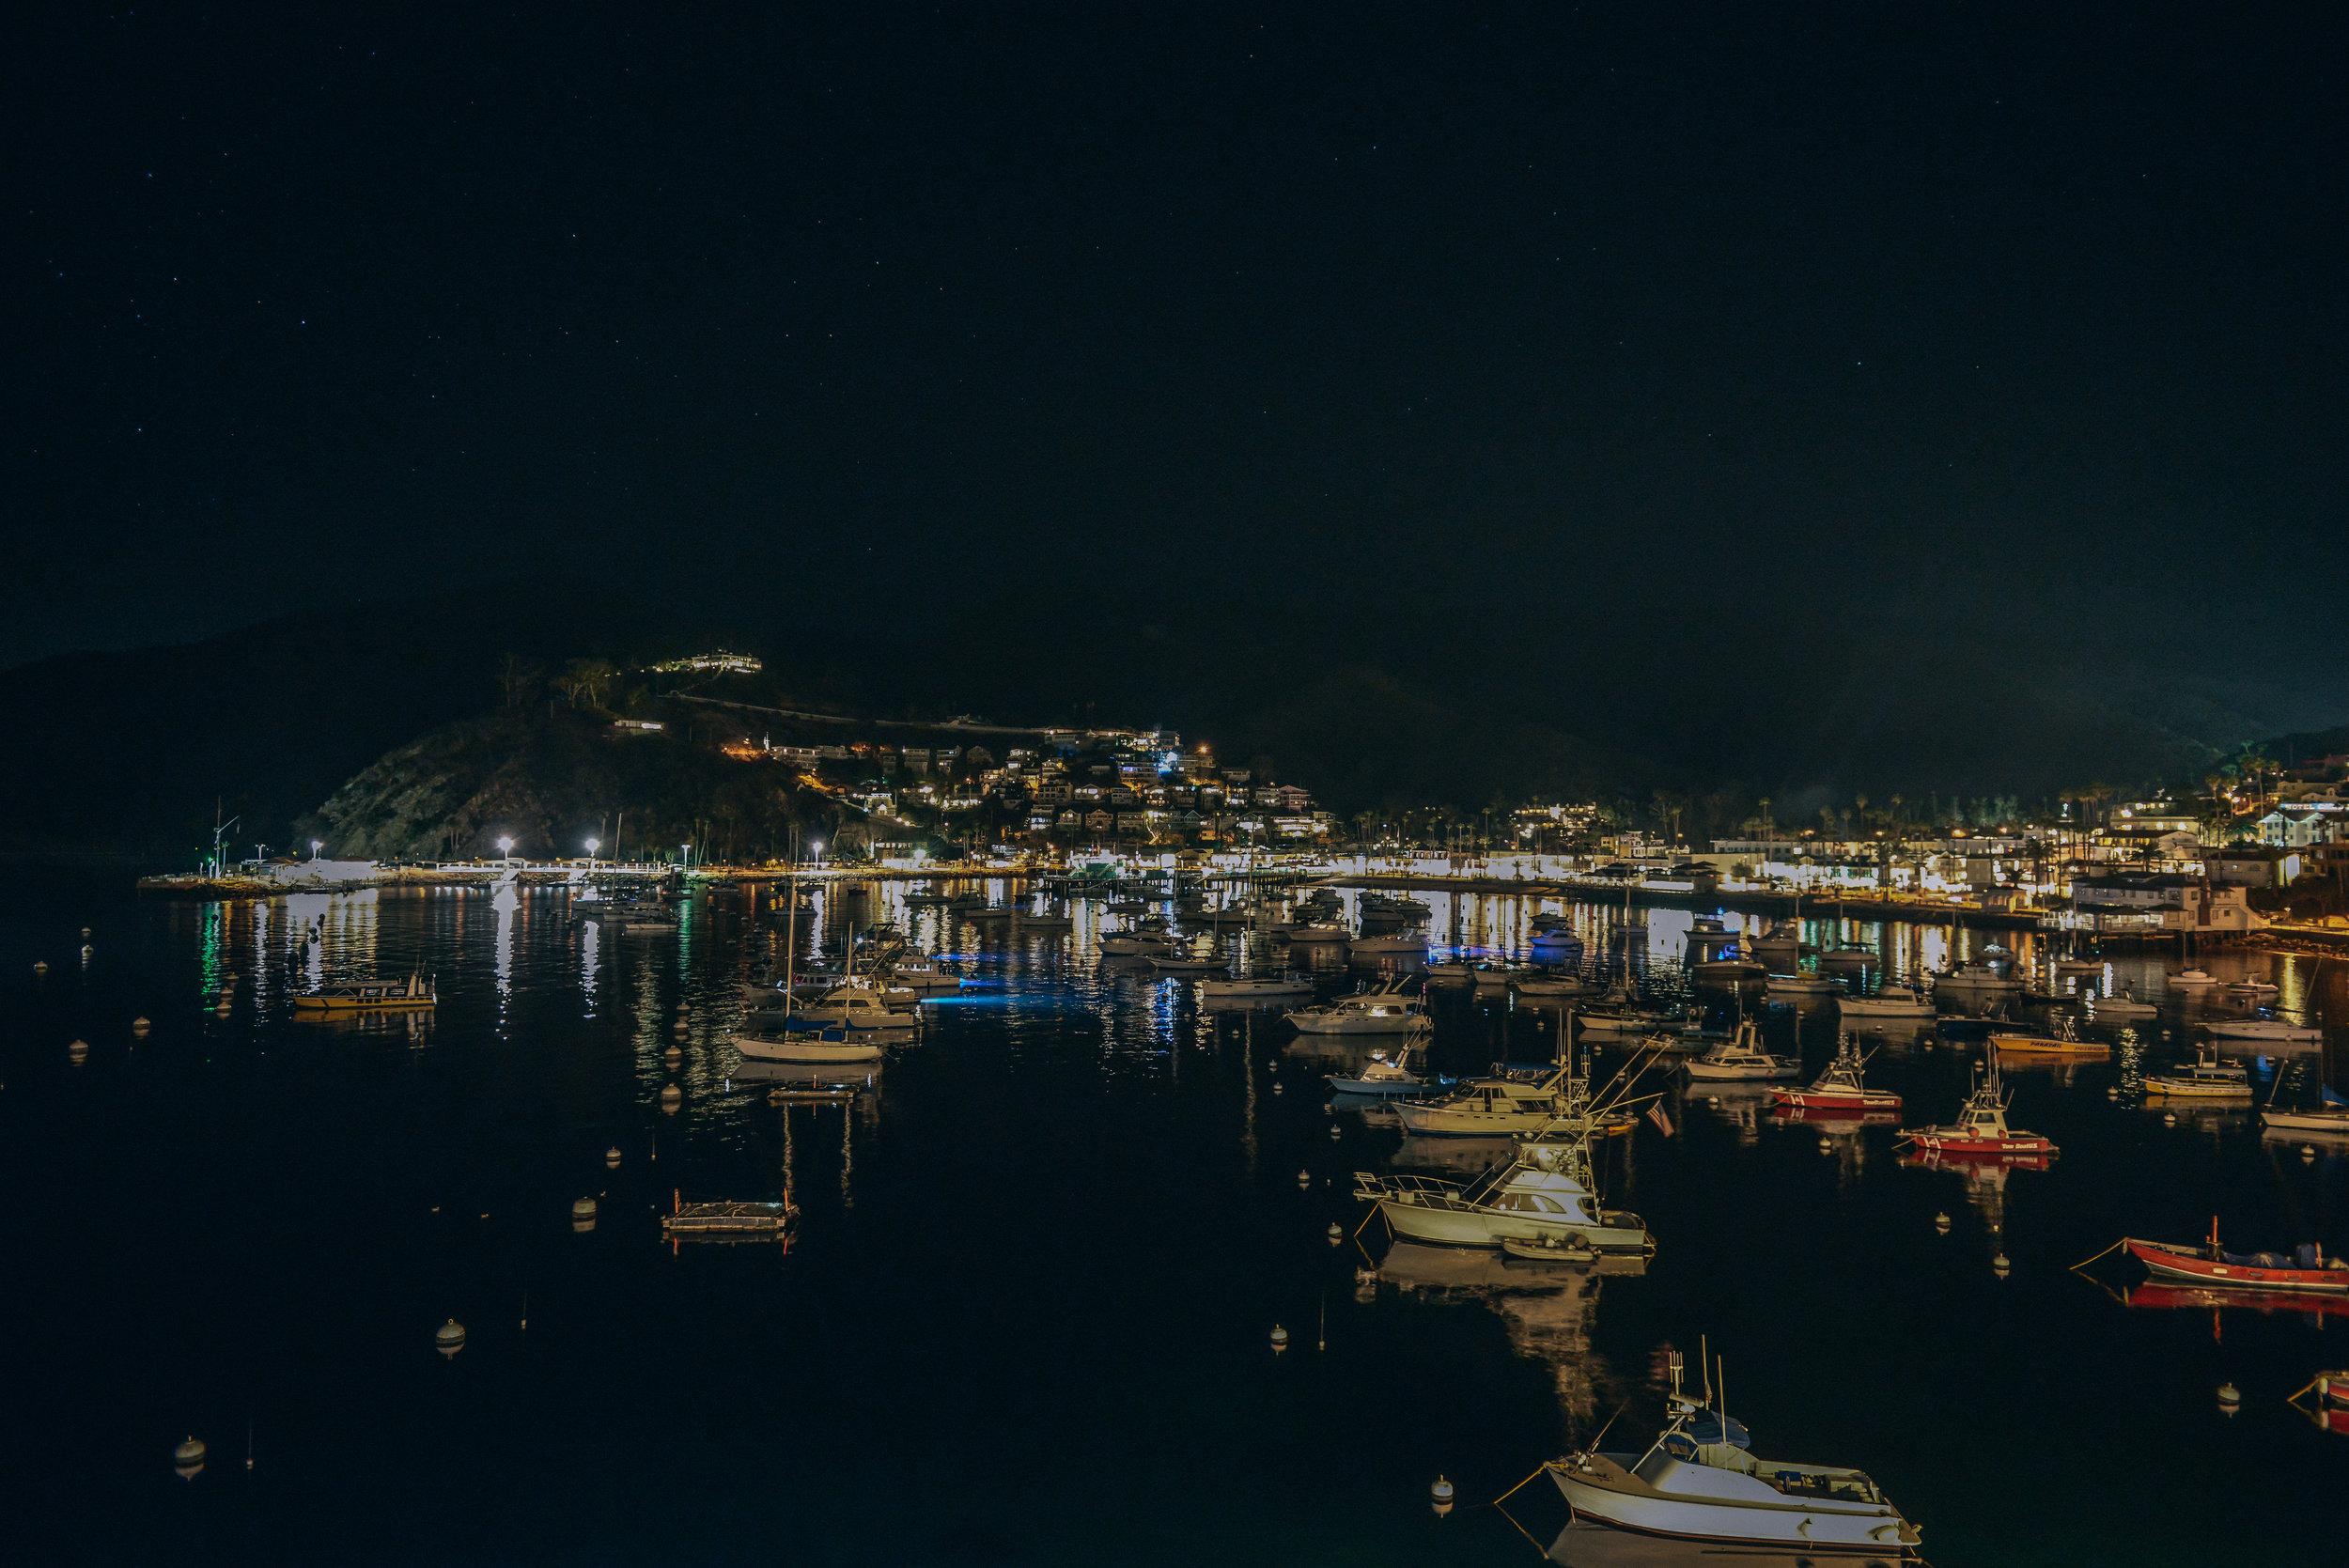 catalina-island-by-lisa-linh